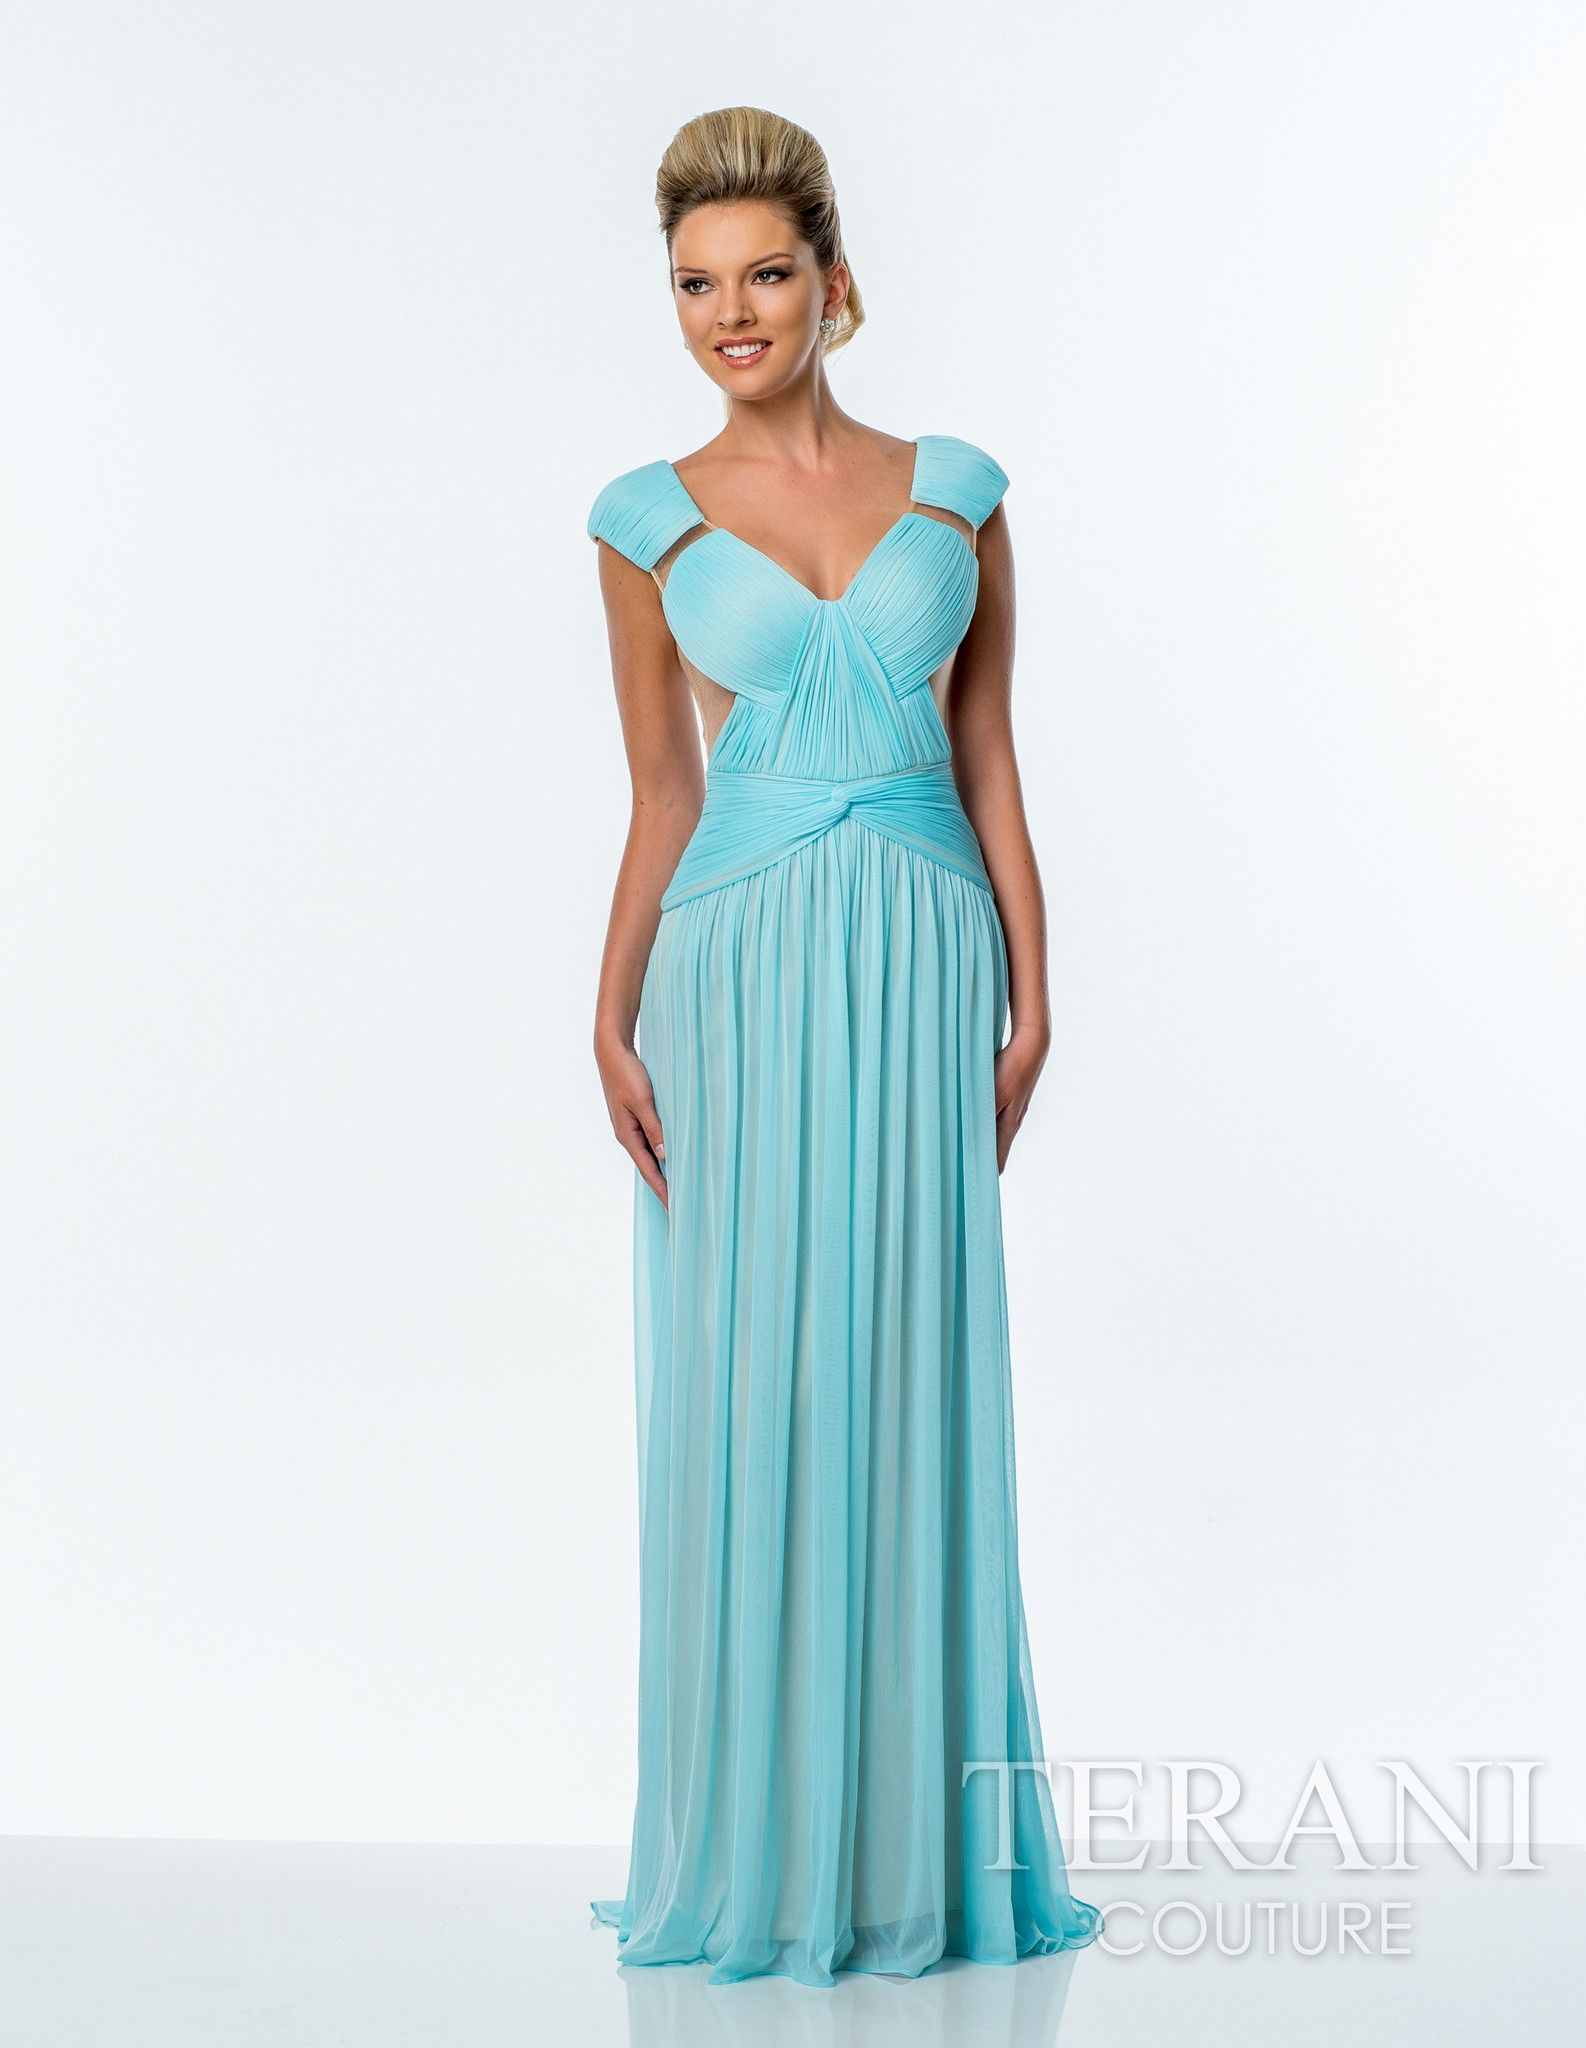 Terani 151P0045 | Long fancy dresses, Drop and Ships